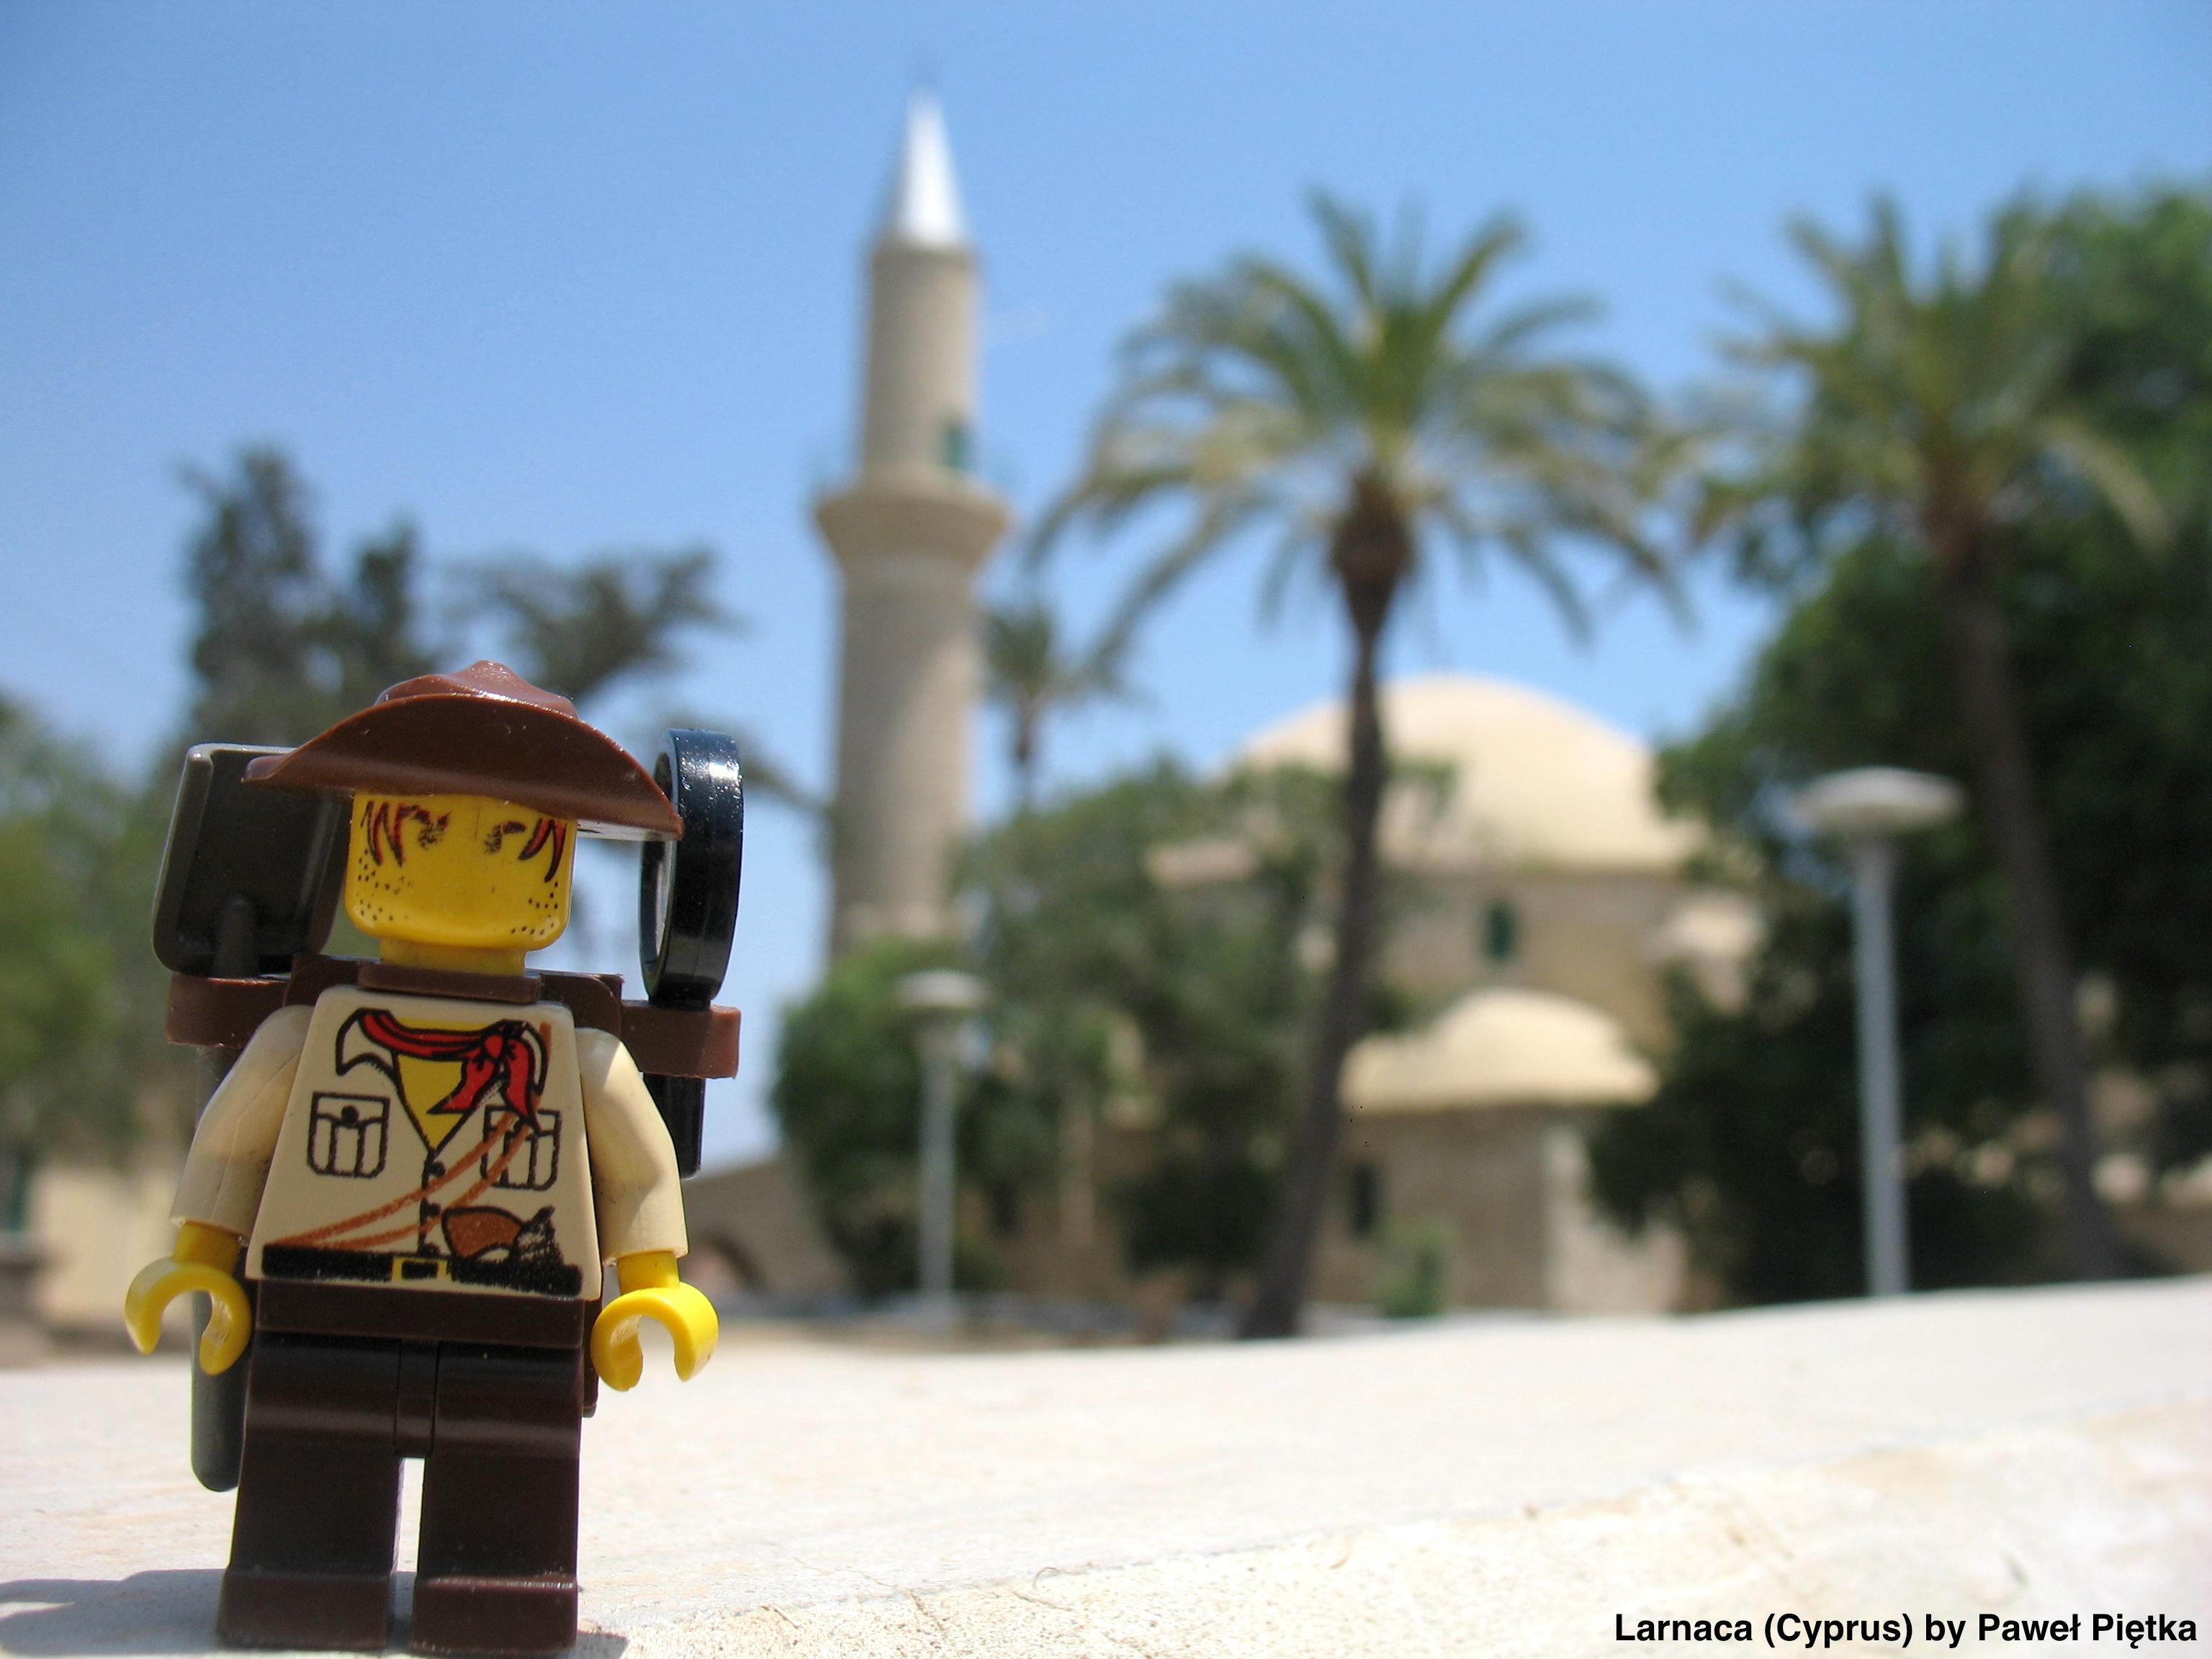 Larnaca (Cyprus) - Hala Sultan Tekke Mosque of Umm Haram